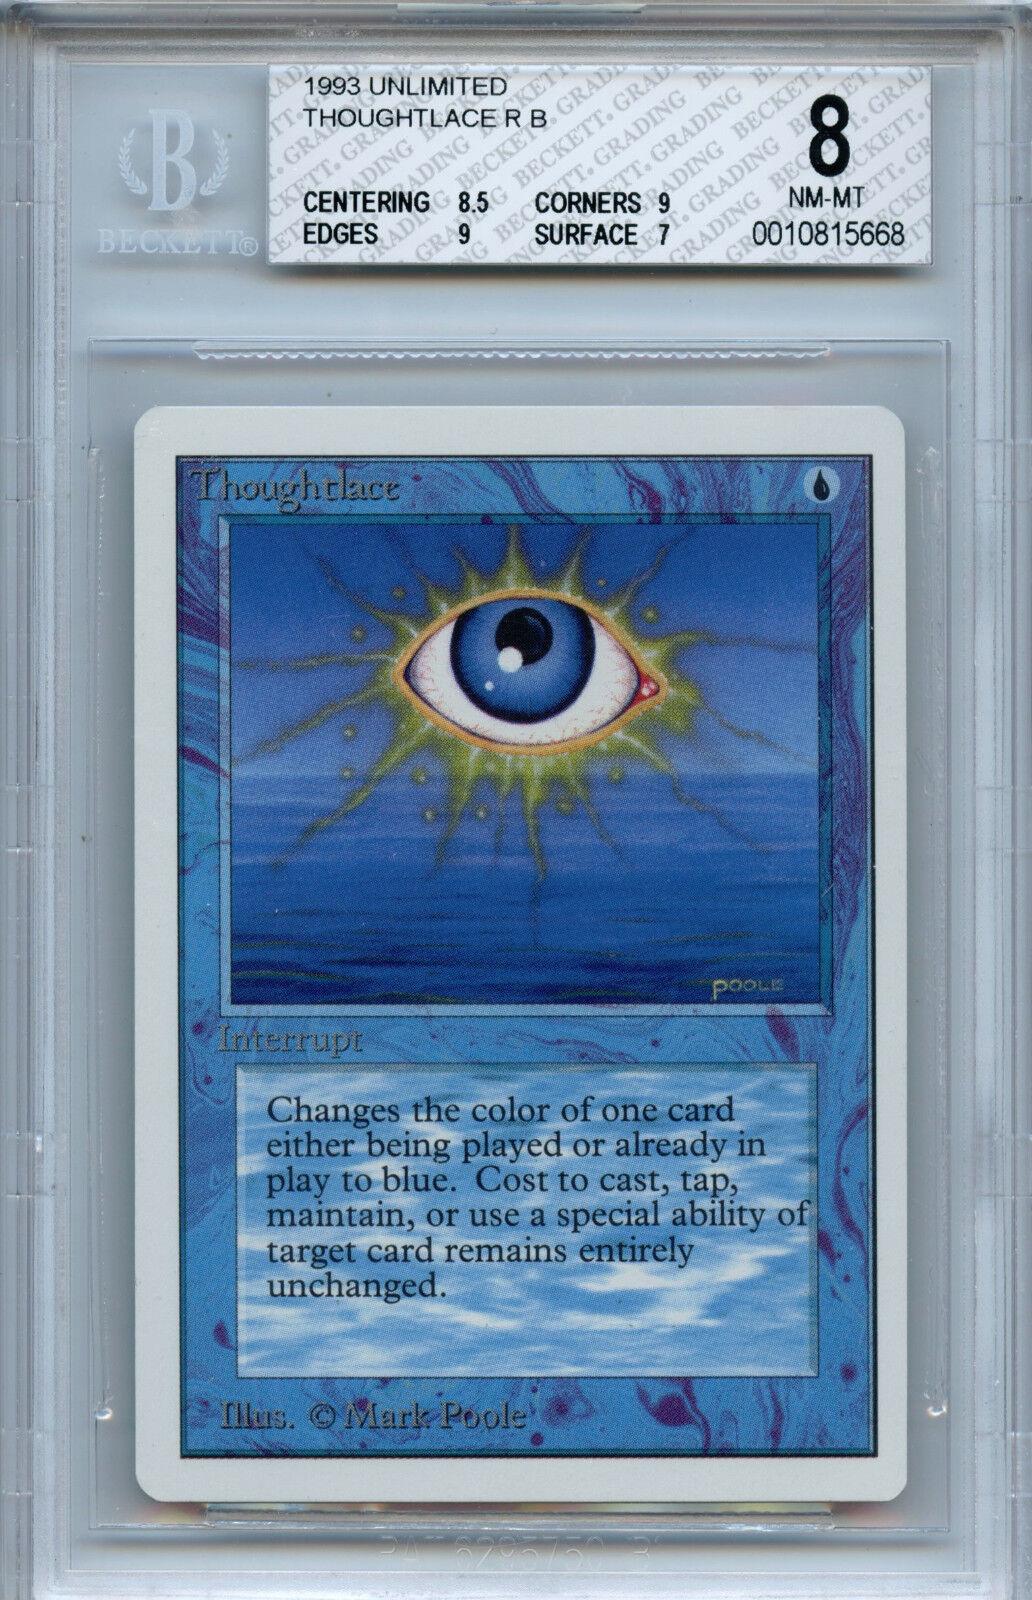 Mtg unbegrenzt thoughtlace bgs 8,0 (8) nm-mt karte magie amricons 5668